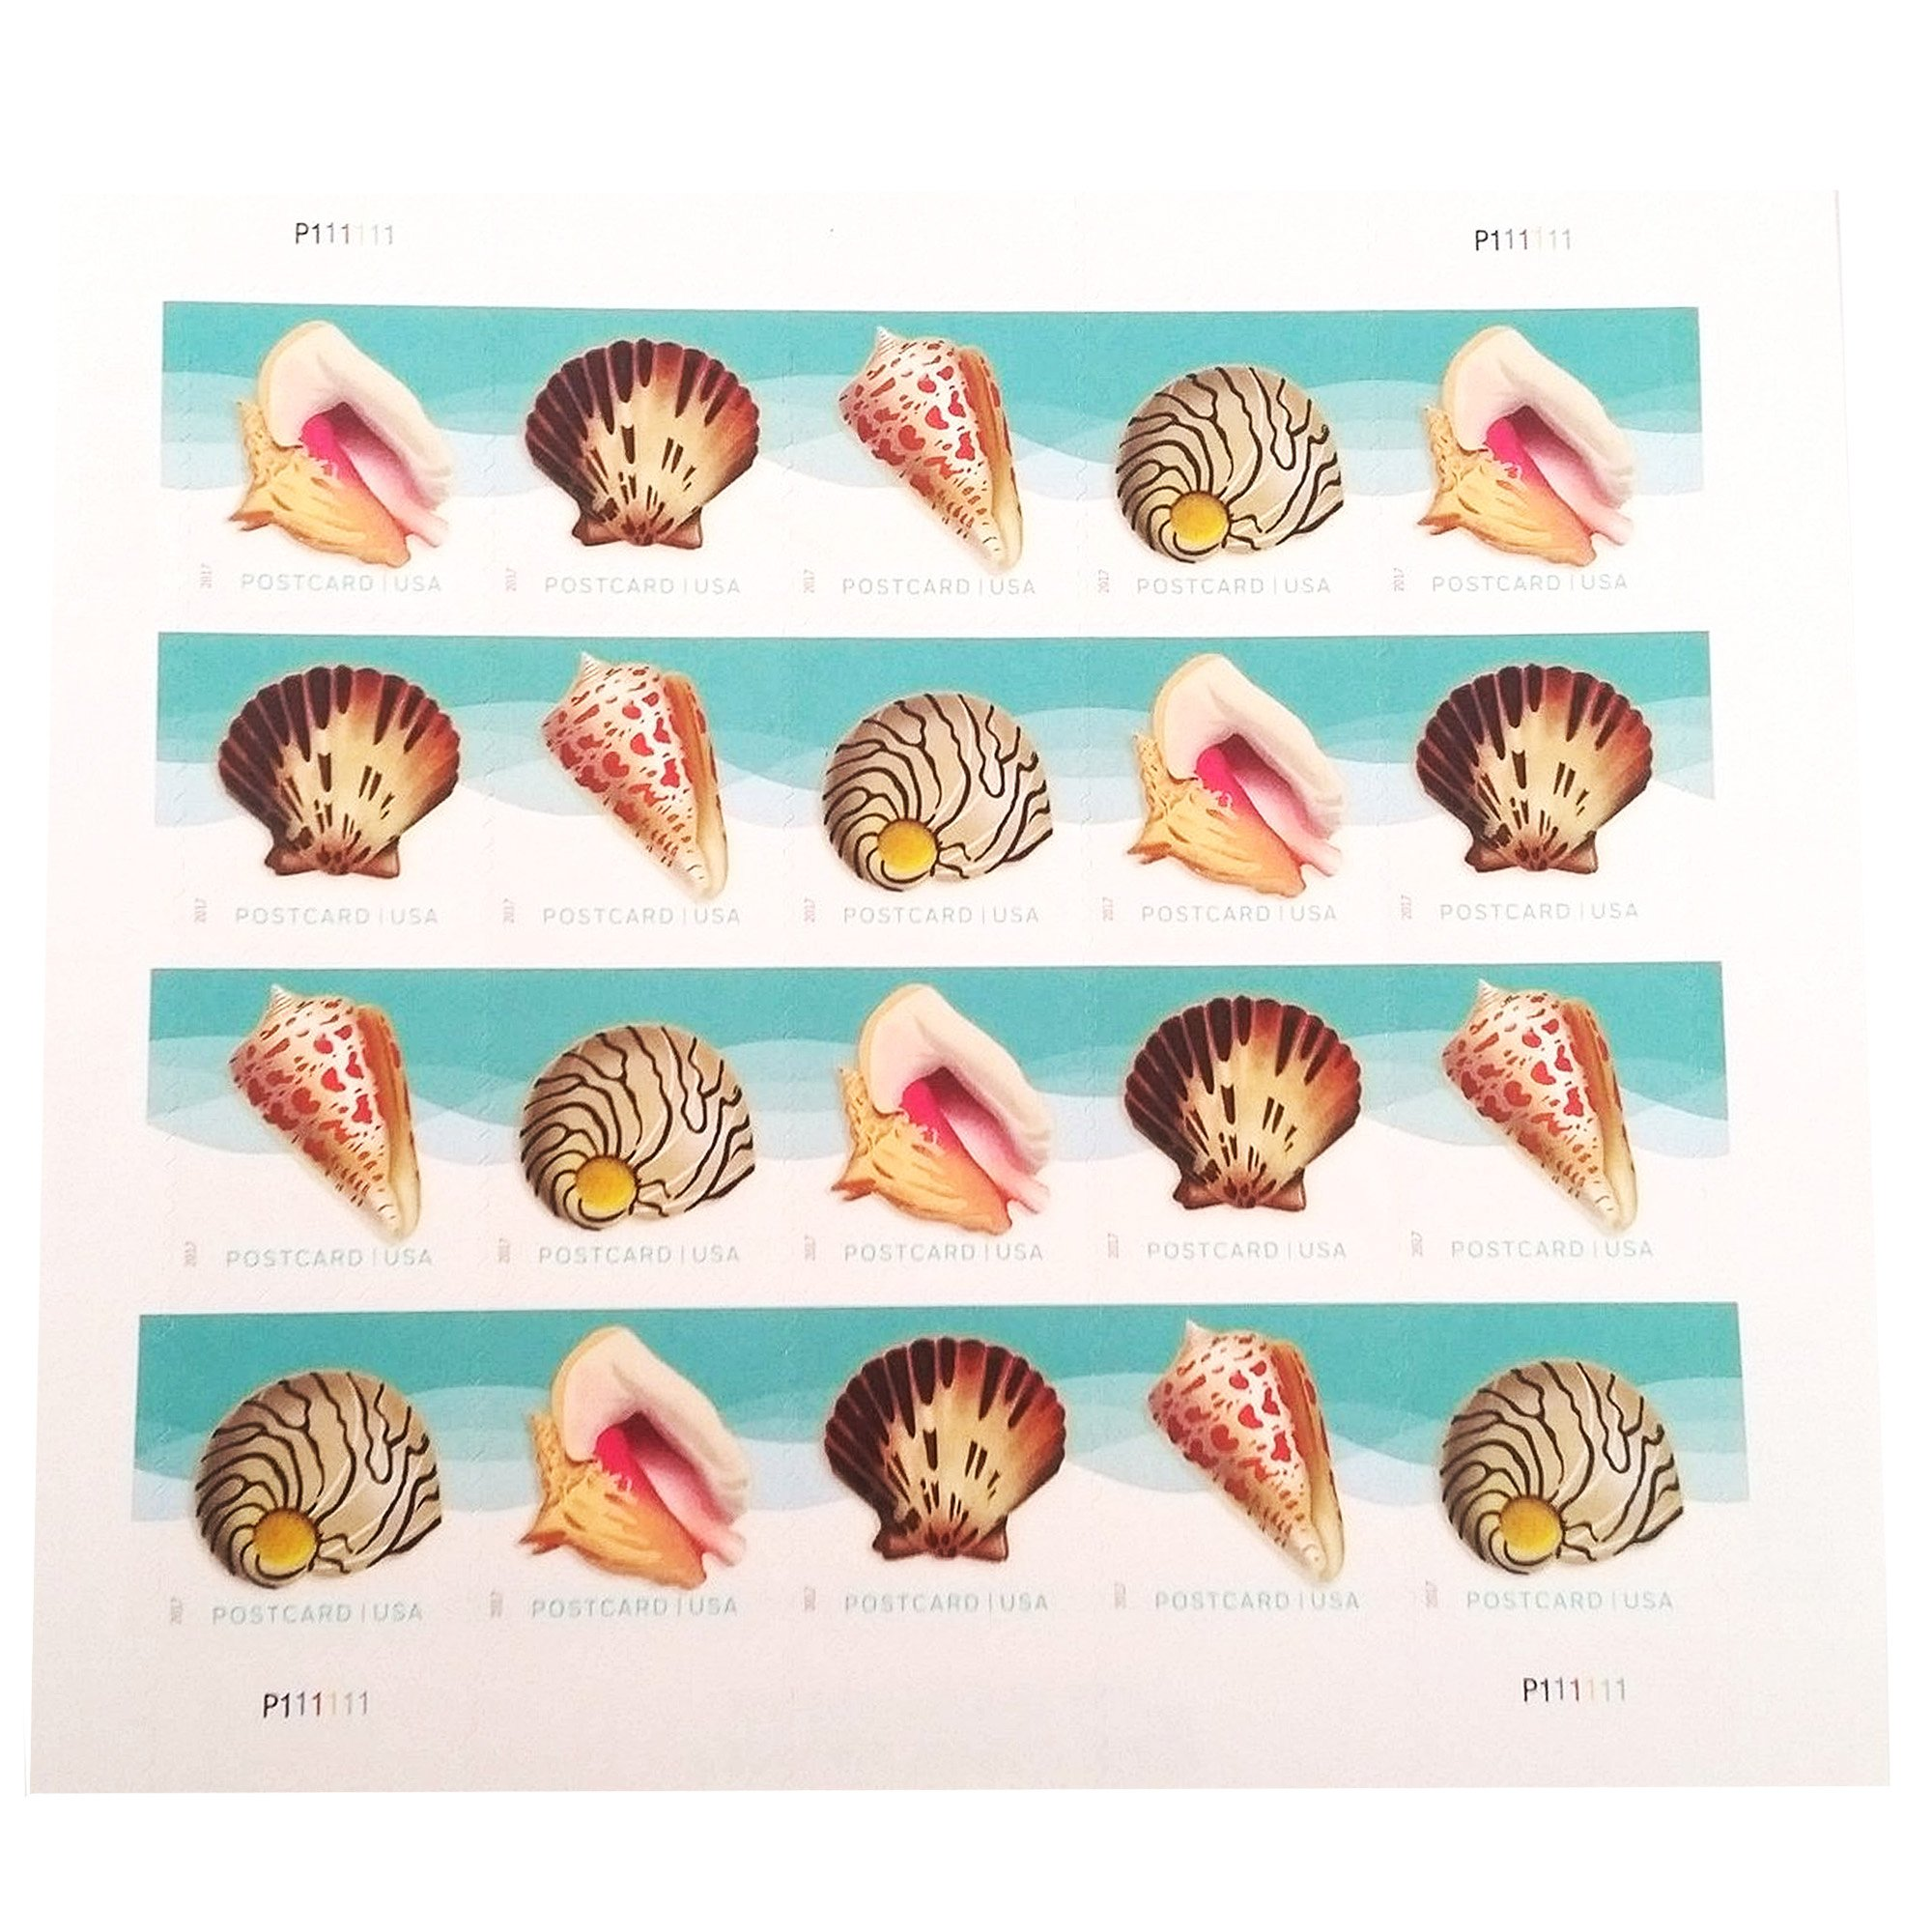 USPS Seashells Postcard Stamps, Sheet of 20